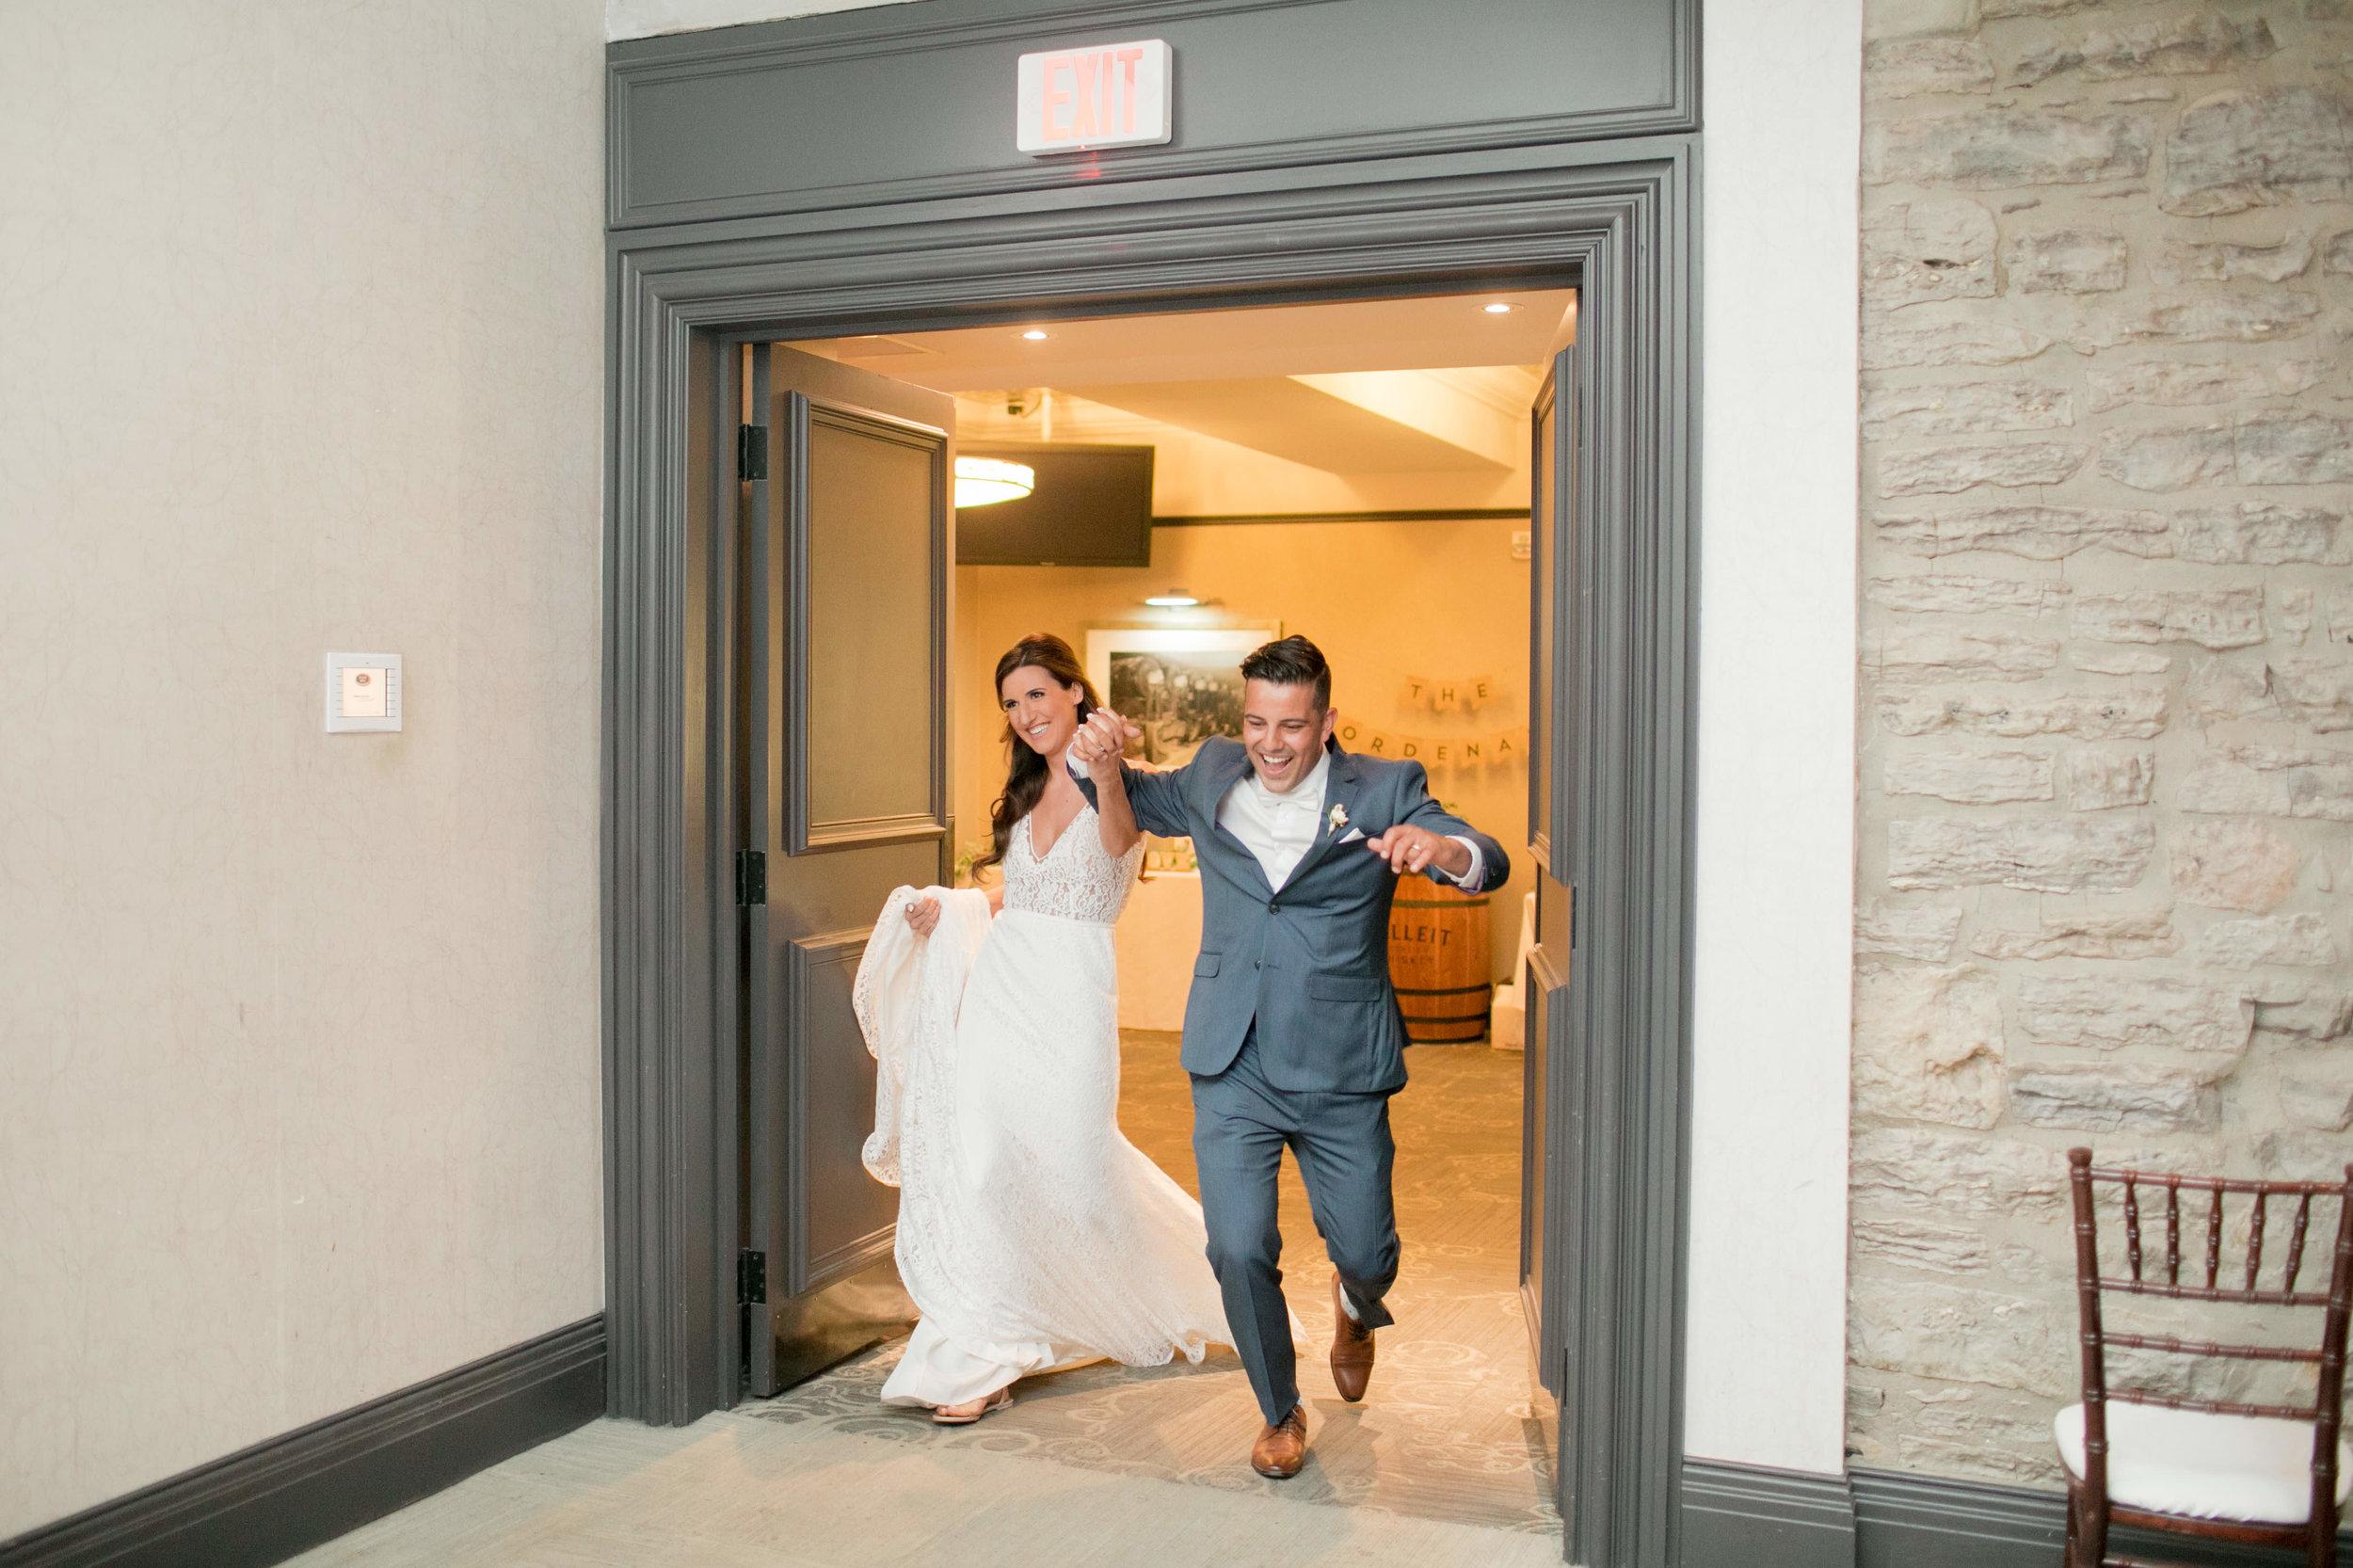 Miranda___Daniel___Daniel_Ricci_Weddings___High_Res._Finals_524.jpg